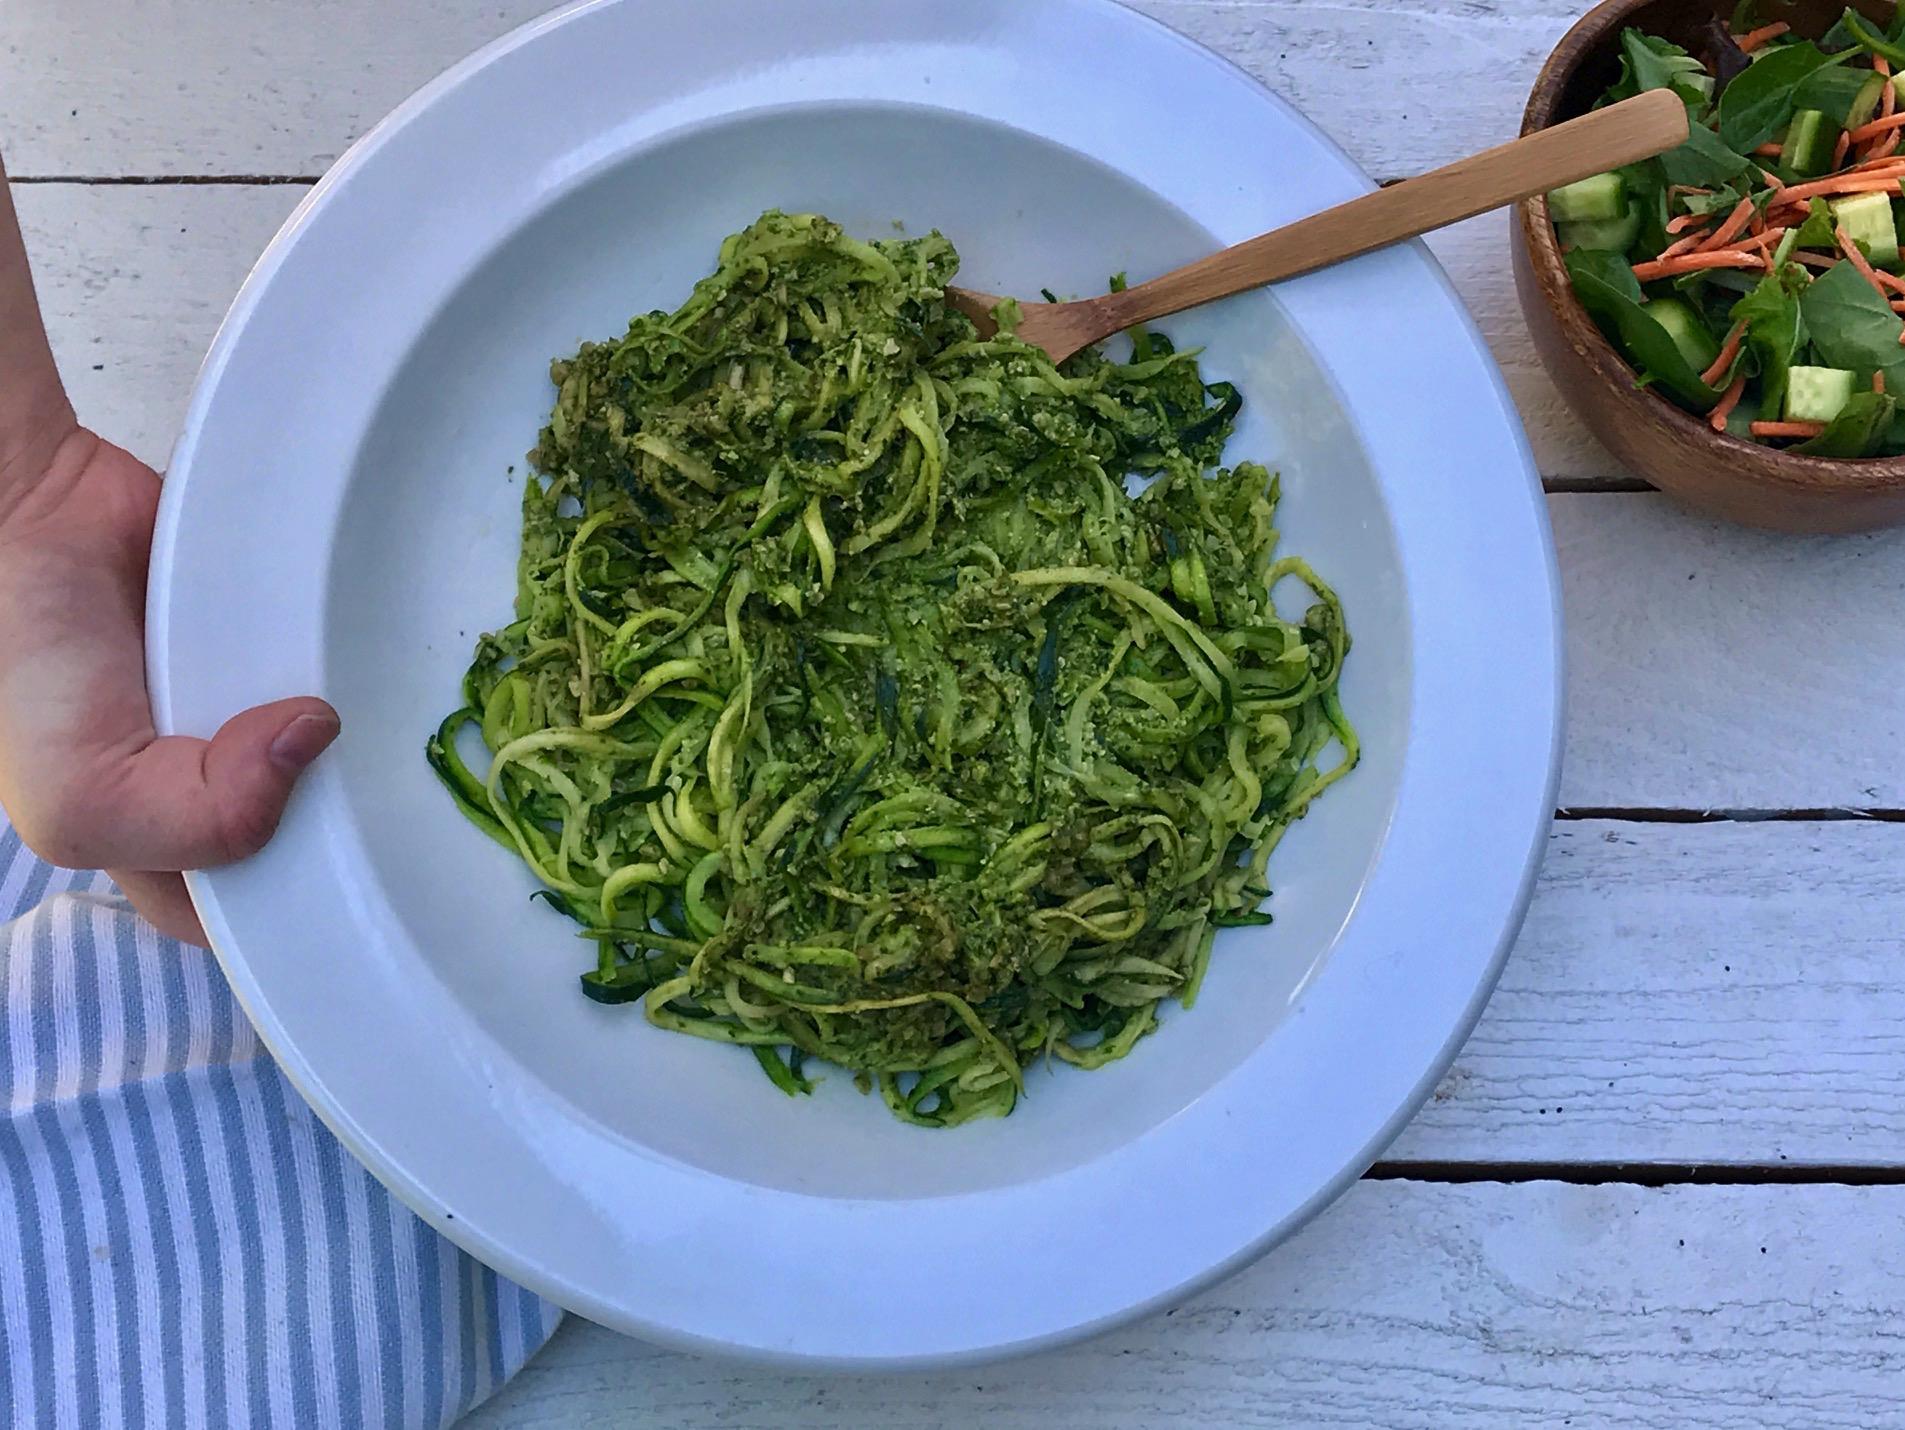 Herb Zucchini Pasta with Salad.jpg